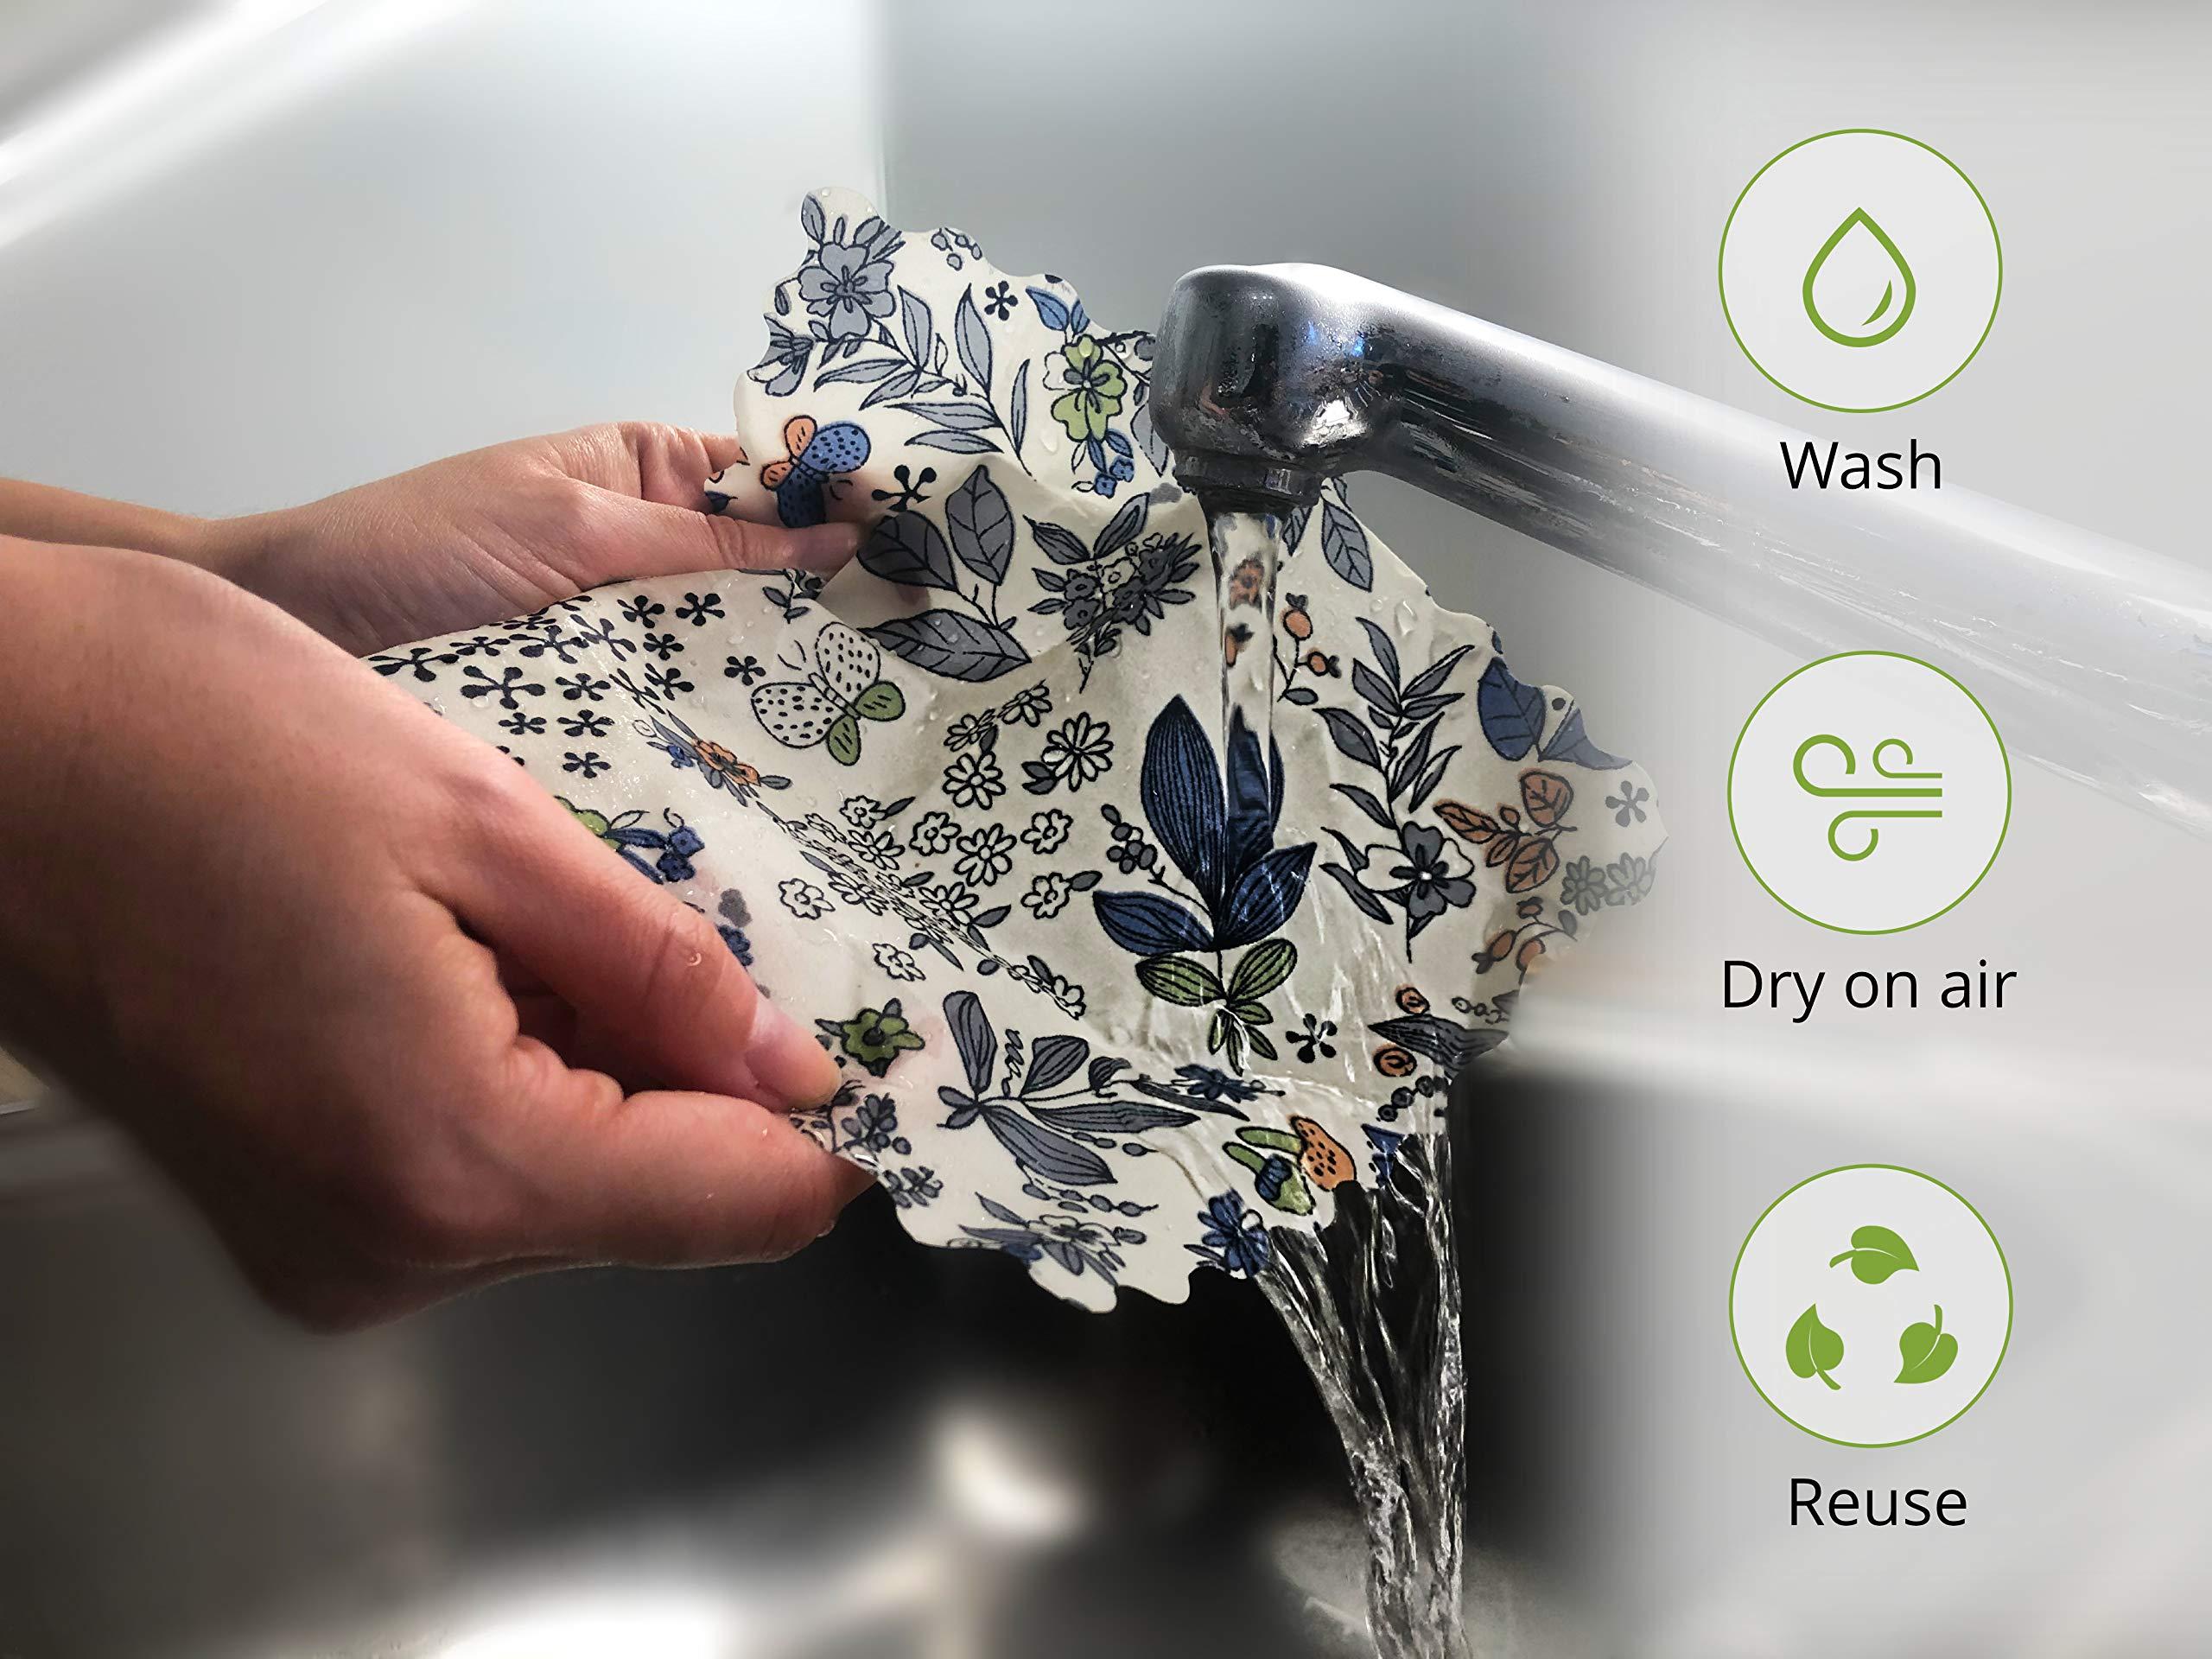 Ecolly® Toallitas de Cera de Abejas I Papel de Cera de Abejas I Premium Beeswax Wraps I Sin plástico y Reutilizable I Juego de 3 (S, M, L)